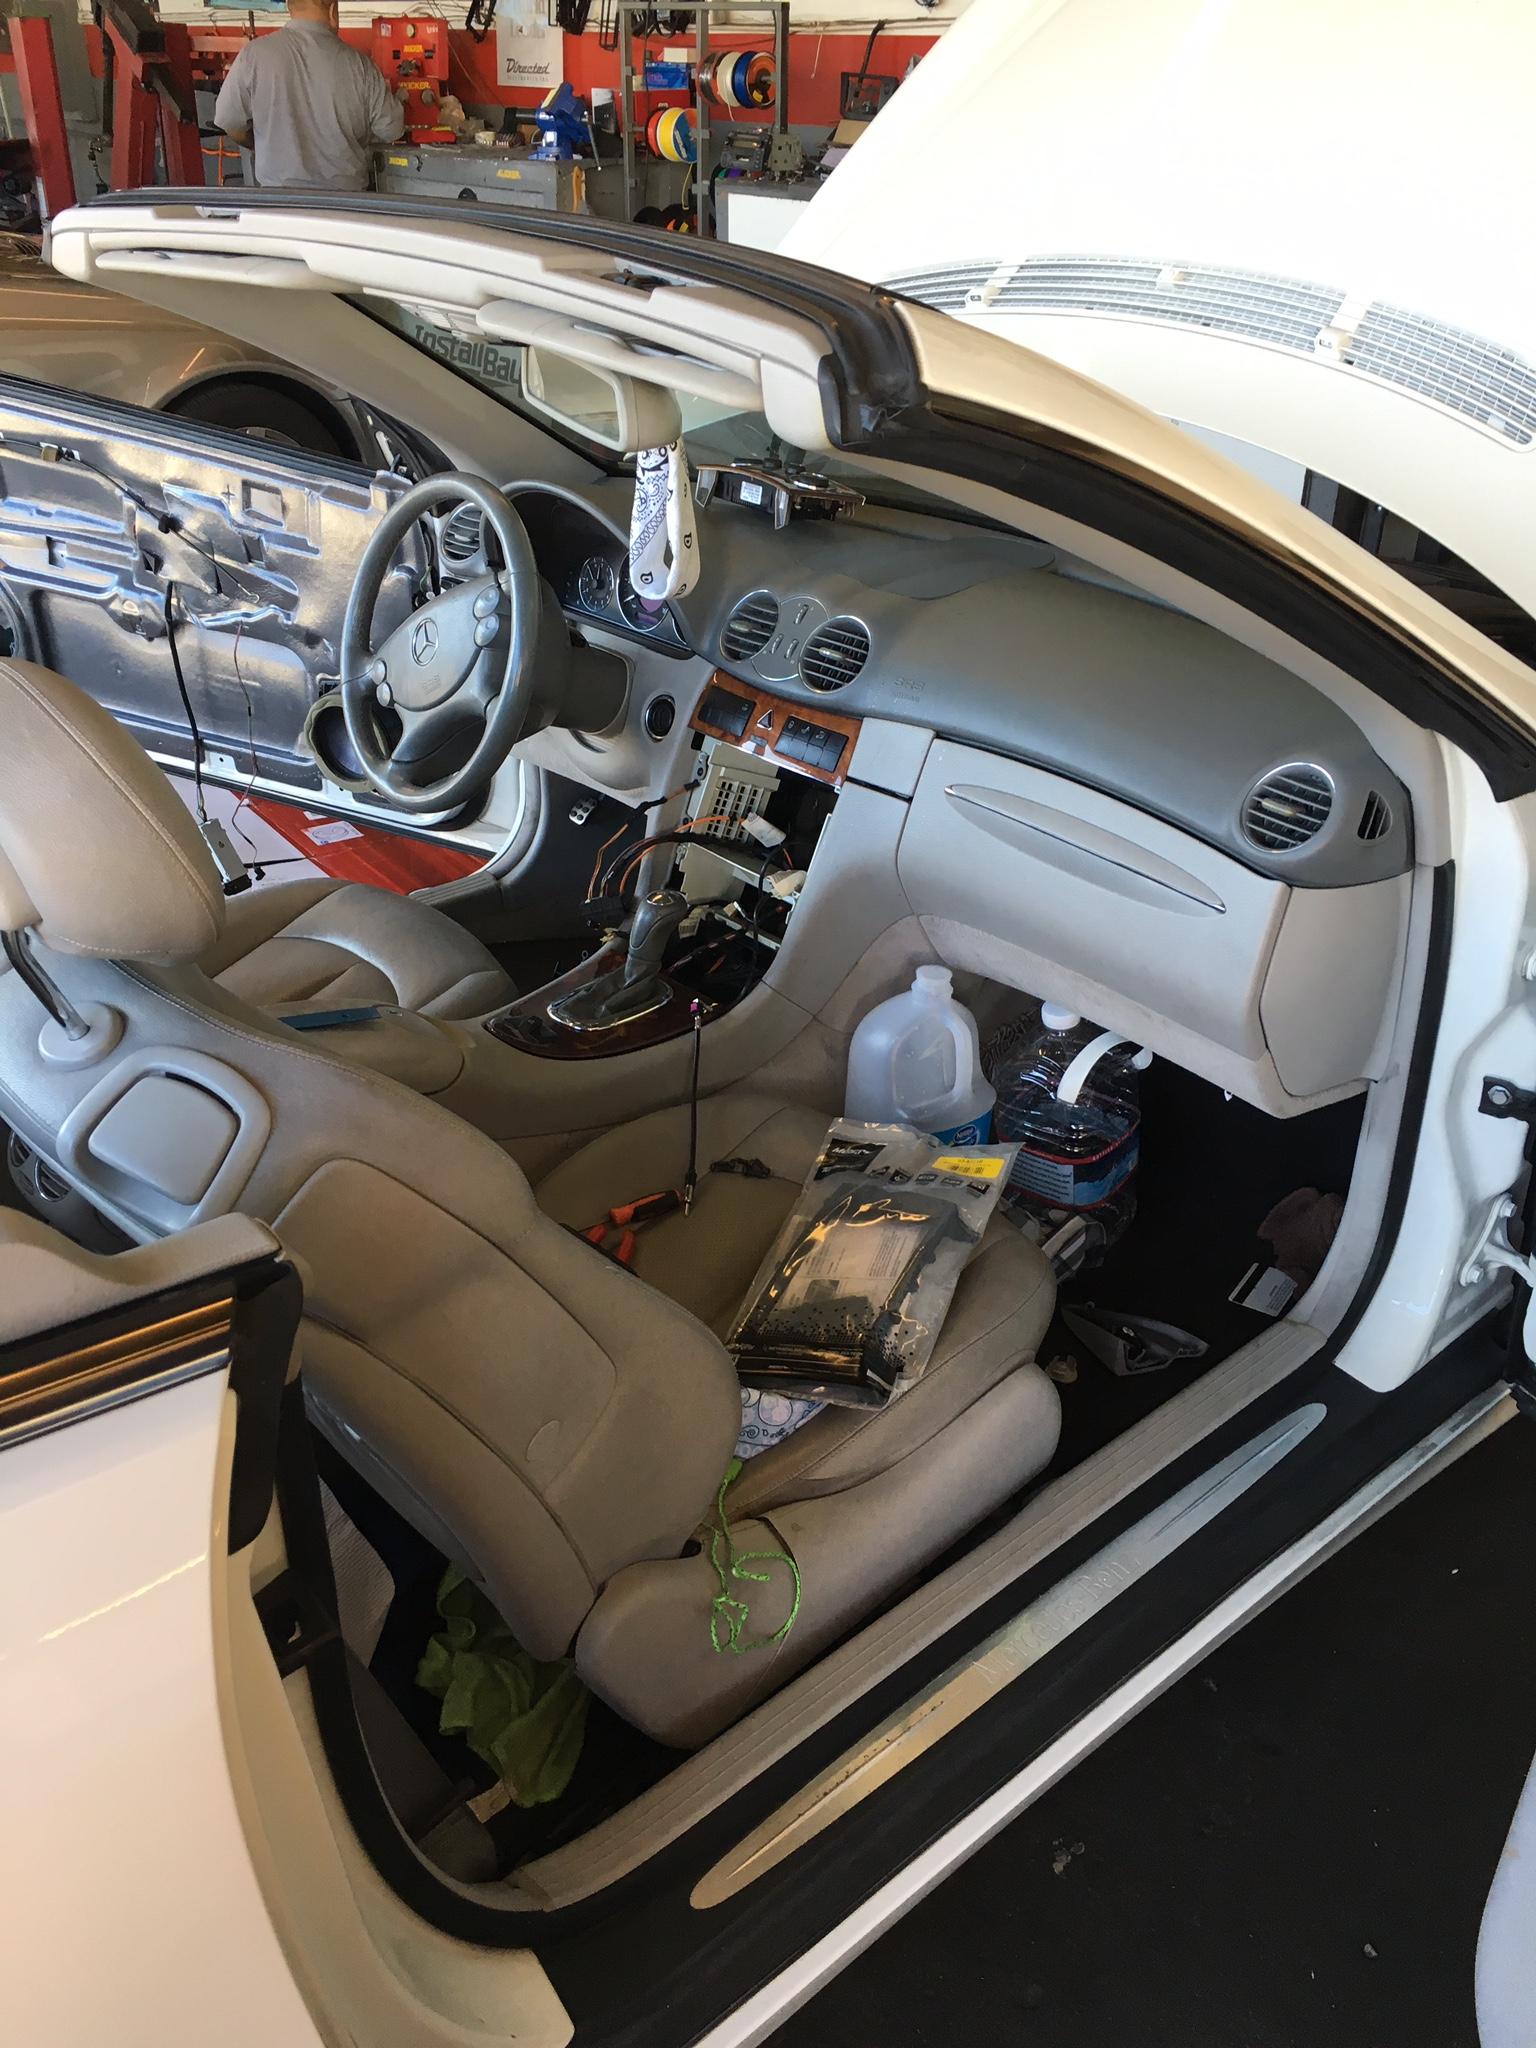 Audiosport offers custom car stereo installation